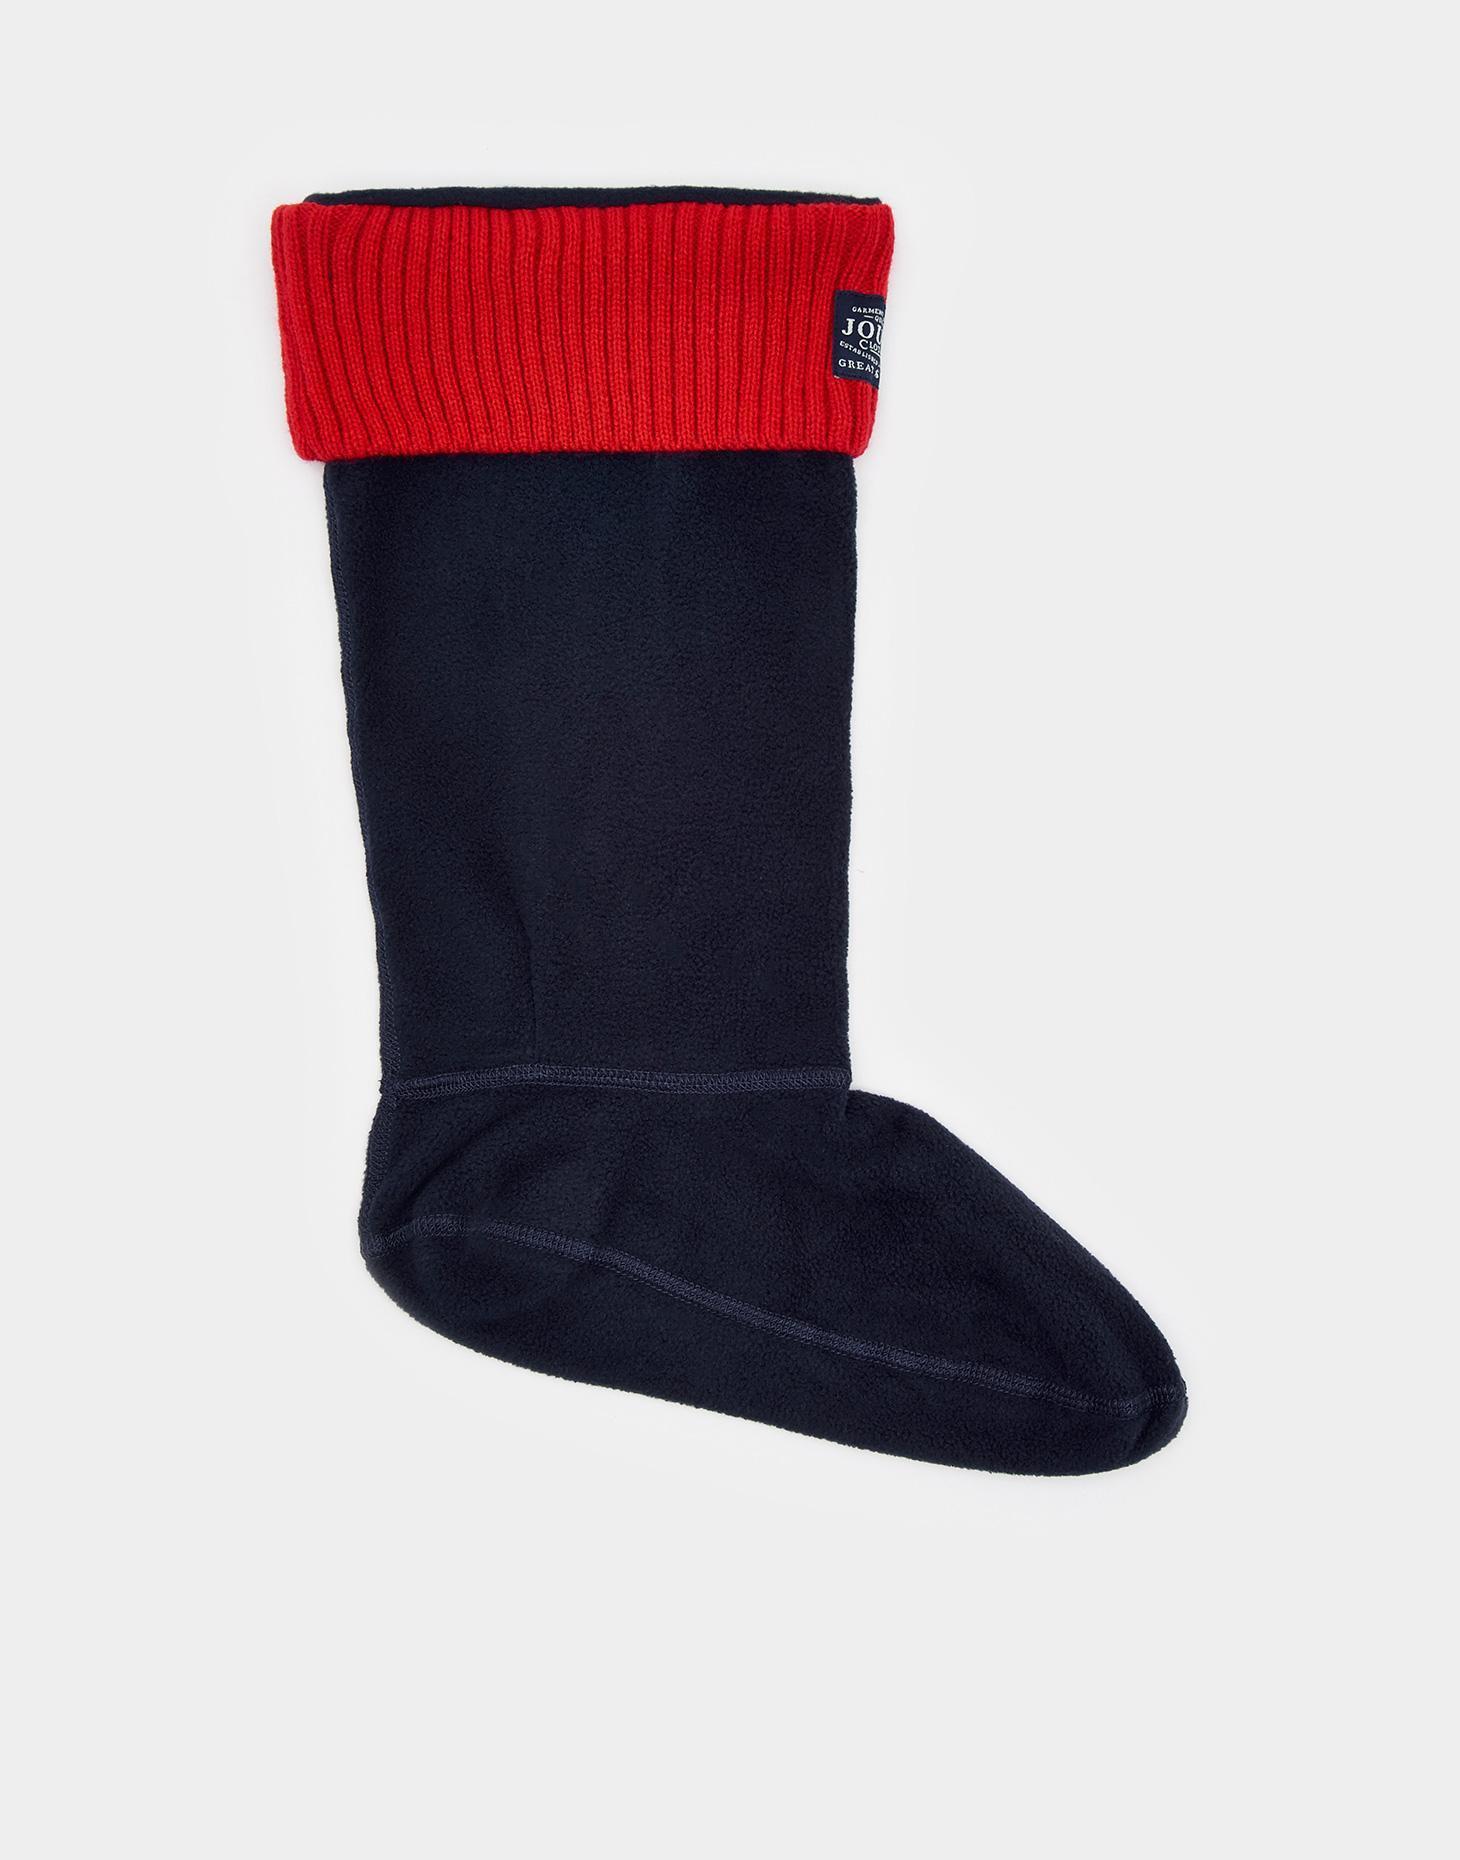 Womens Thermal Fleece Welly Wellington Boot Warm Cosy Soft Wellie Socks